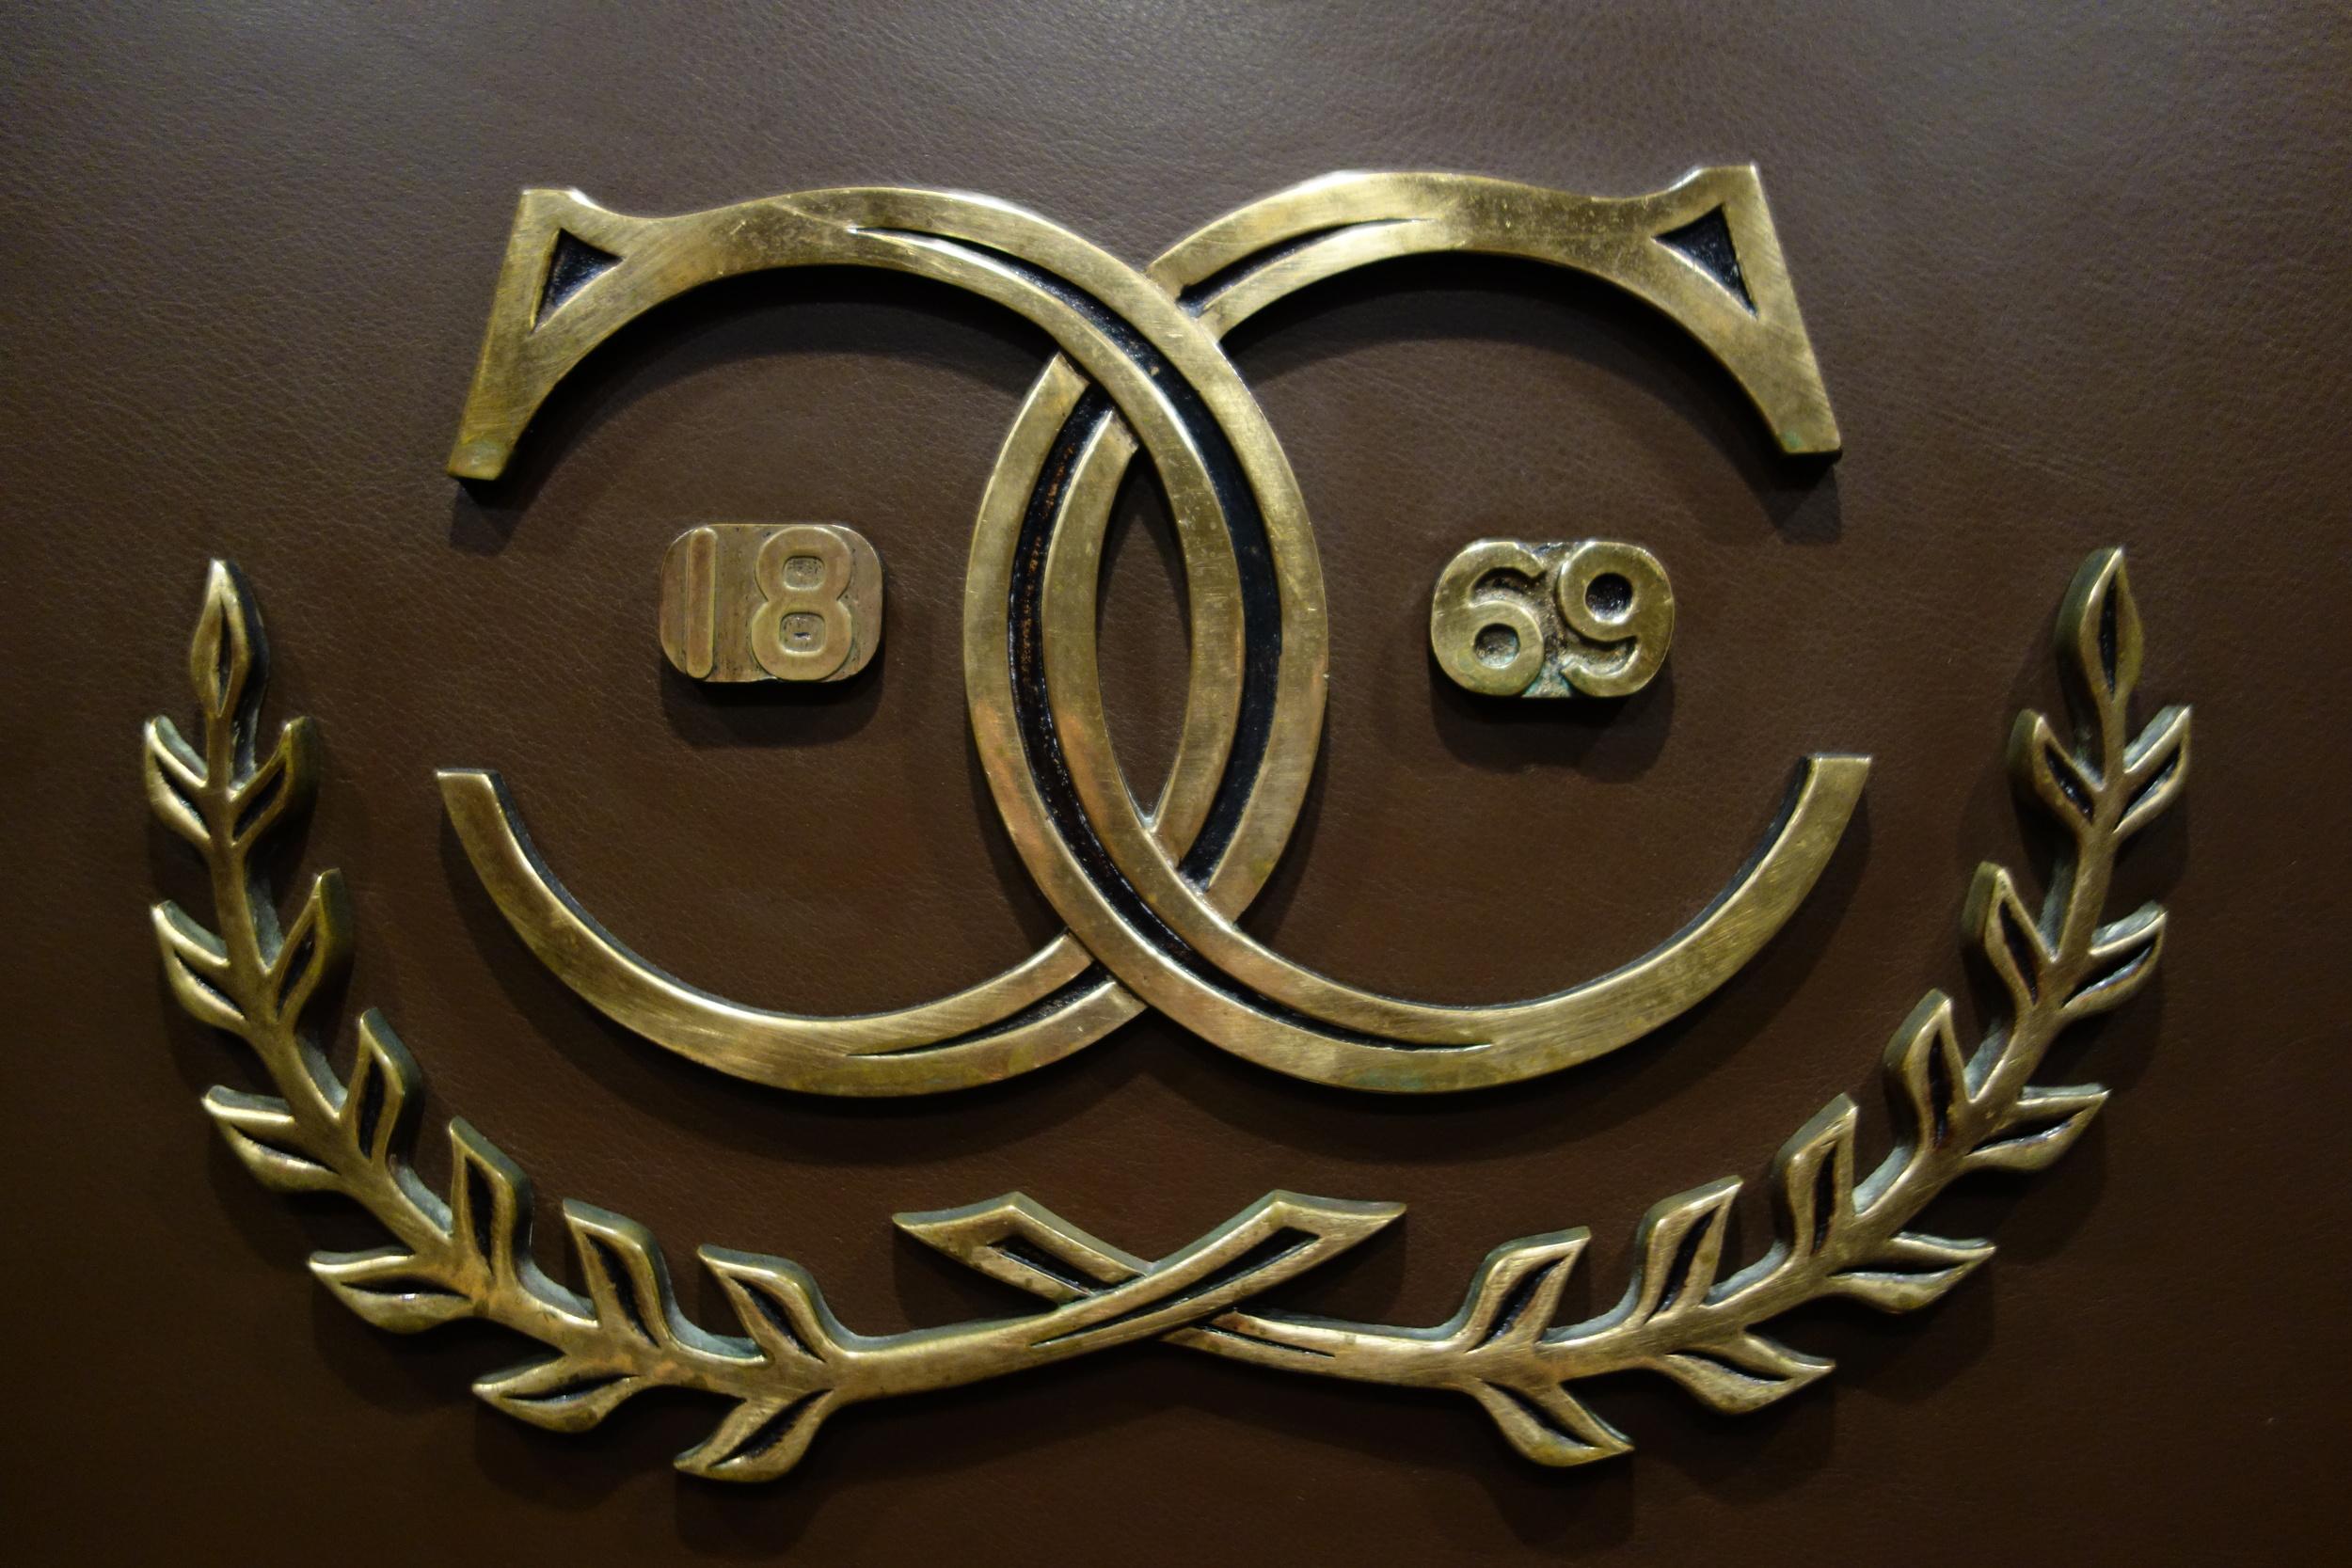 Chicago Club since 1869!